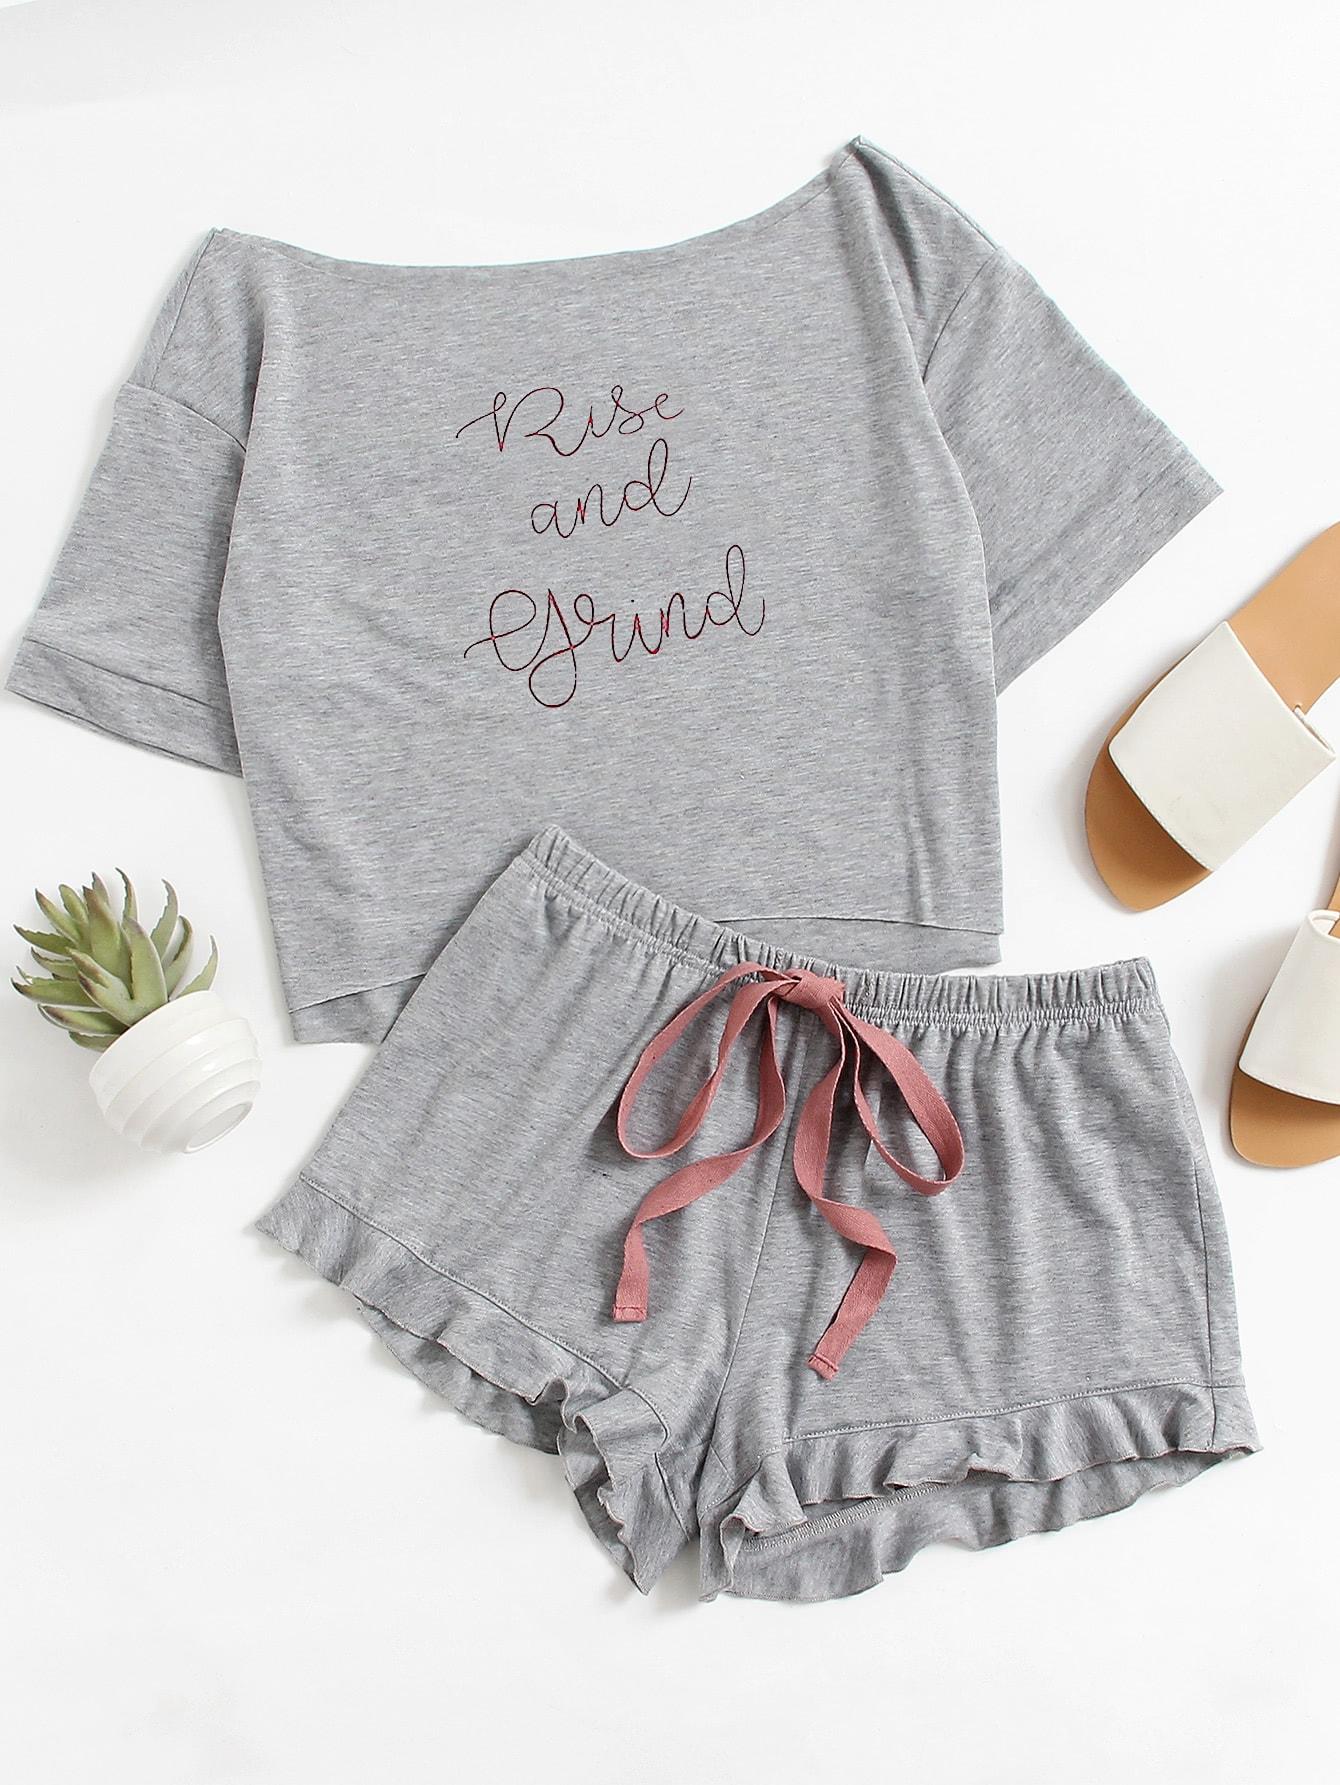 Женская пижамка | Shein